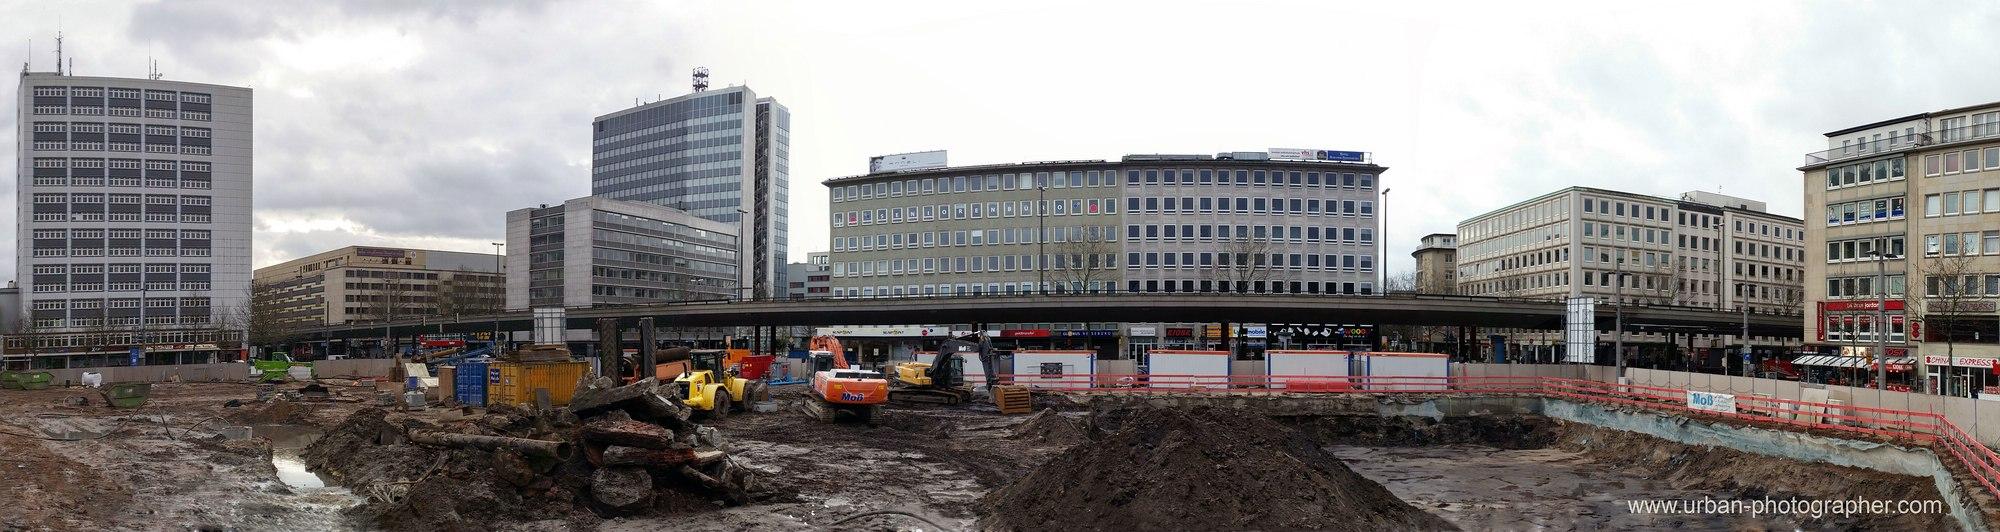 Baustelle Bahnhofsplatz 16